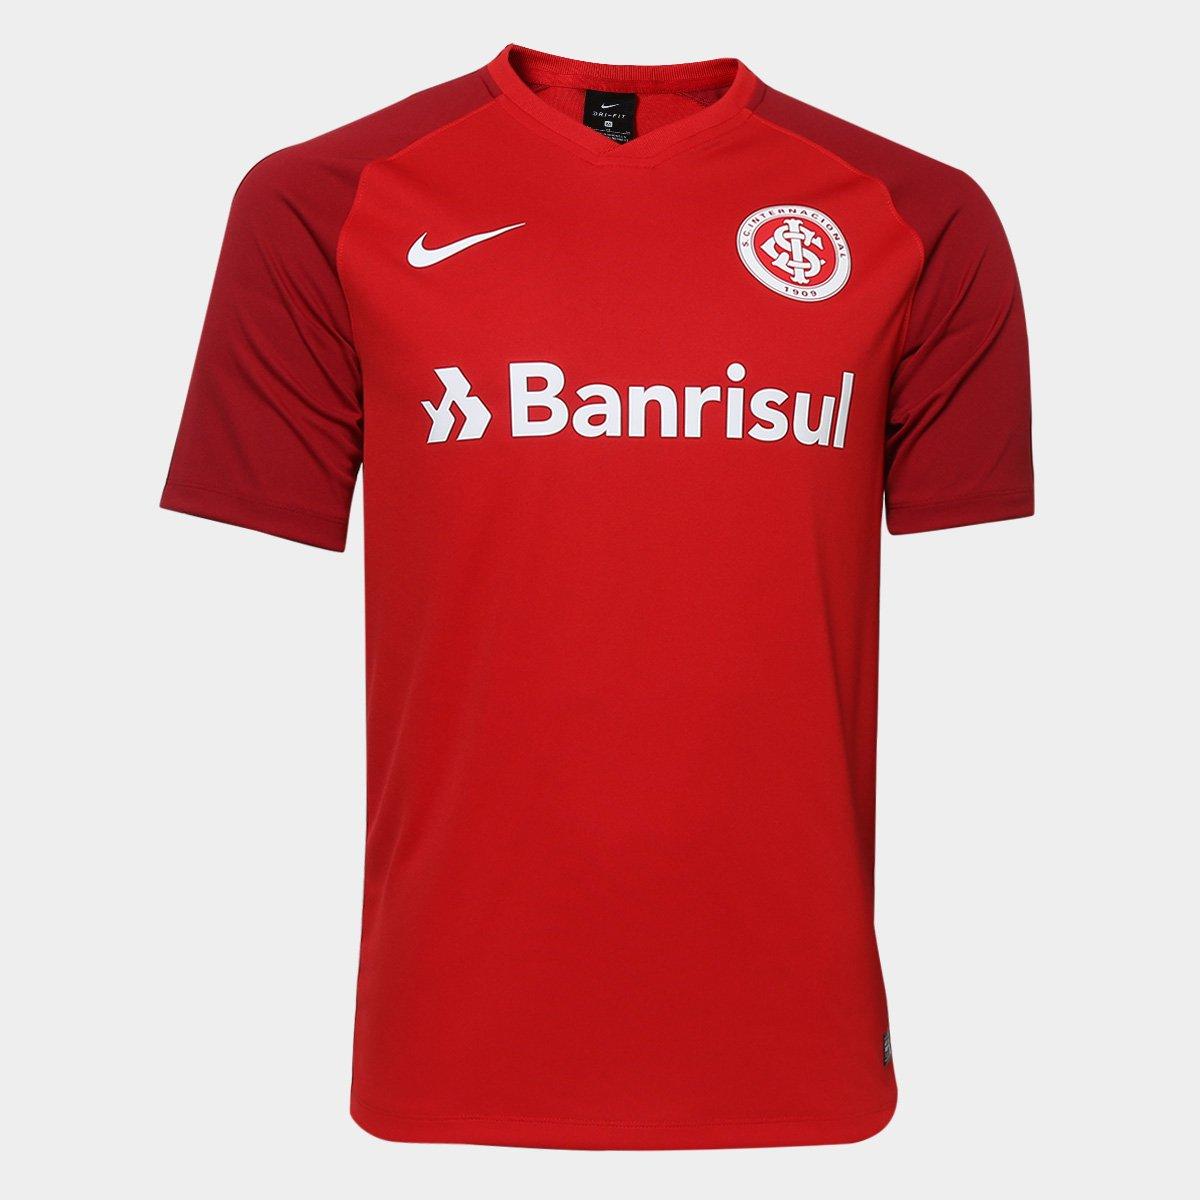 093dc01394233 Camisa Internacional I 2018 s n° - Torcedor Estádio Nike Masculina - Compre  Agora